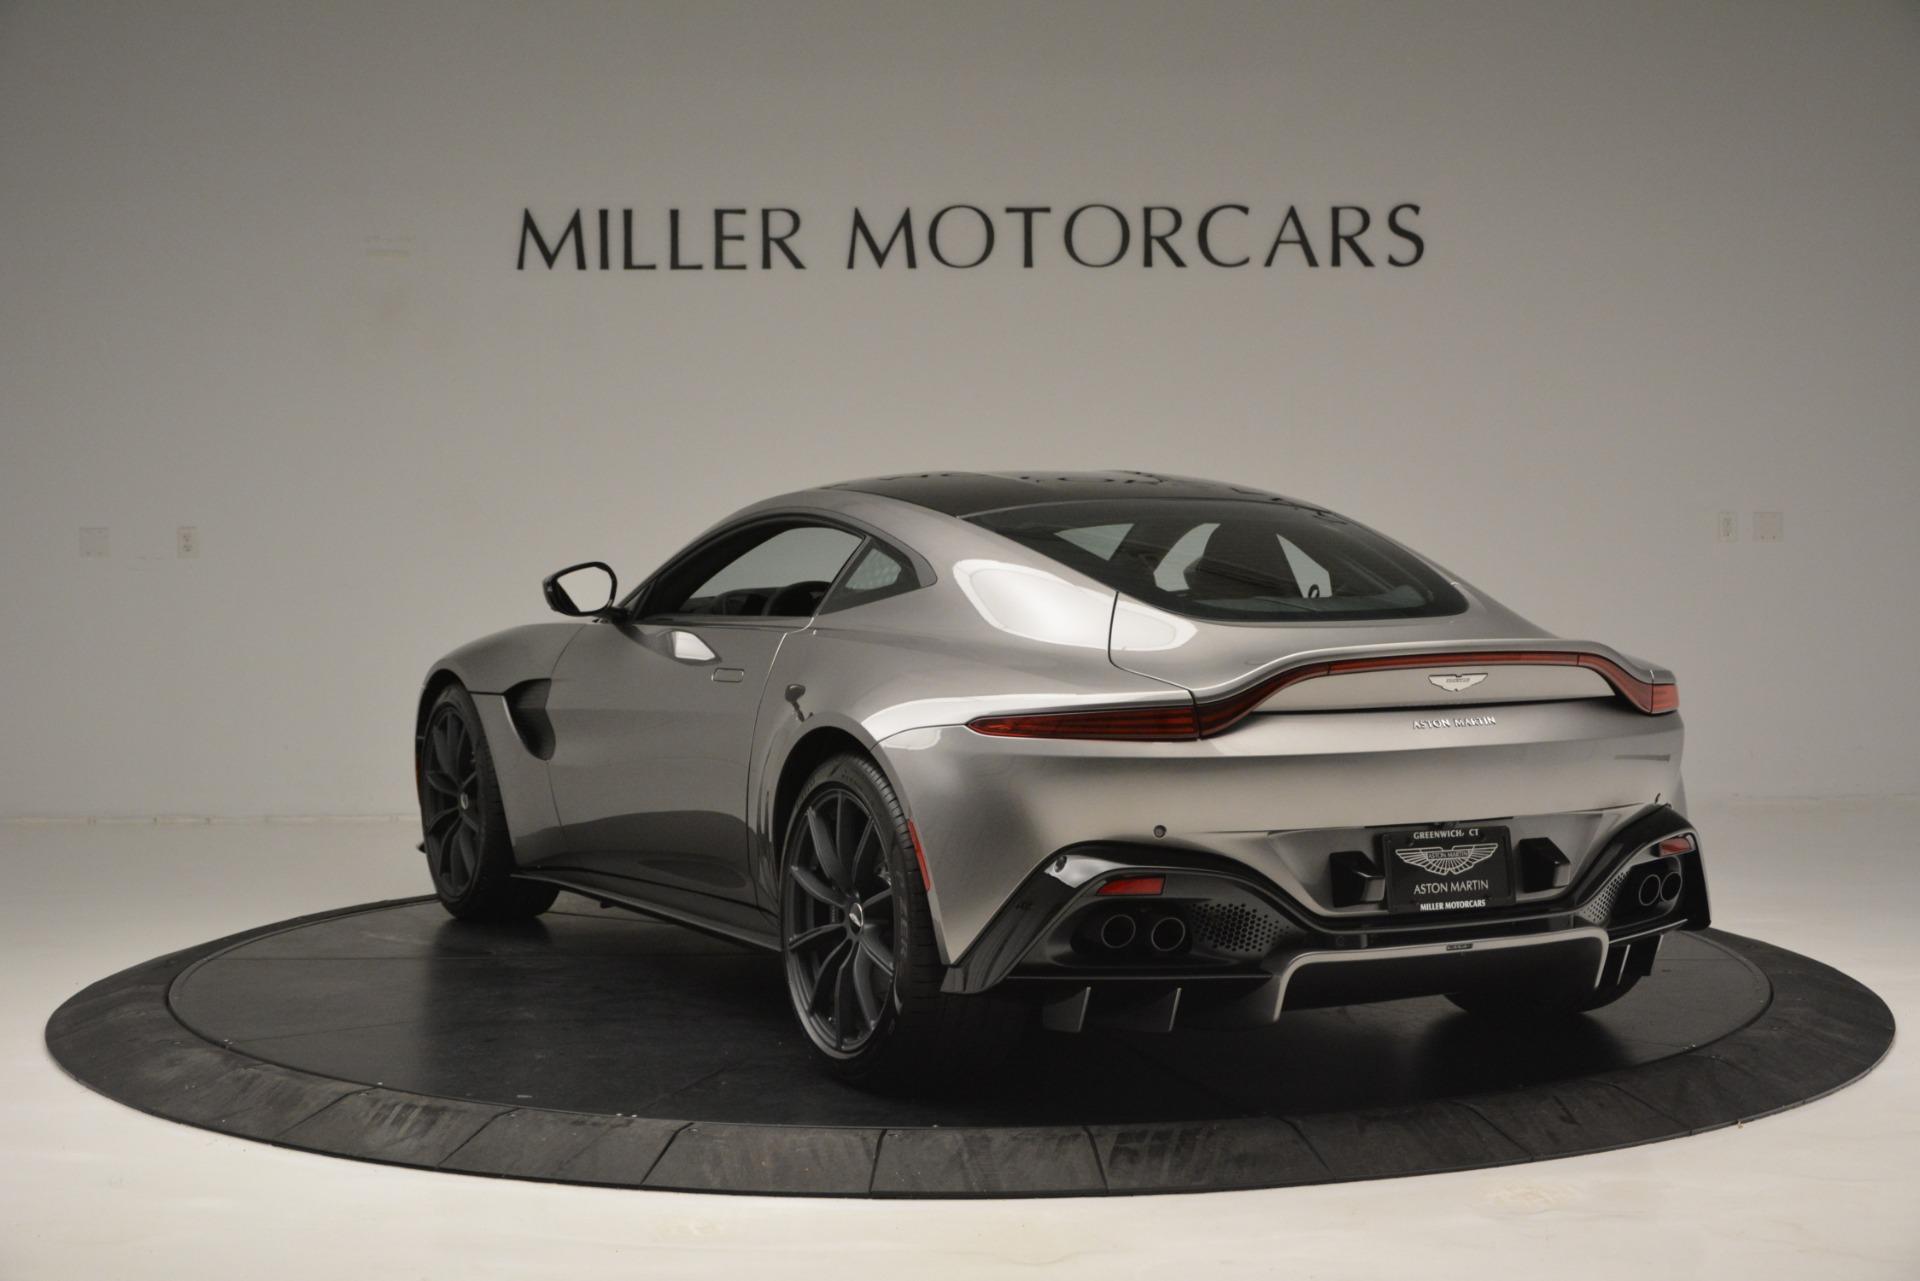 New 2019 Aston Martin Vantage Coupe For Sale In Greenwich, CT. Alfa Romeo of Greenwich, A1335 3122_p5